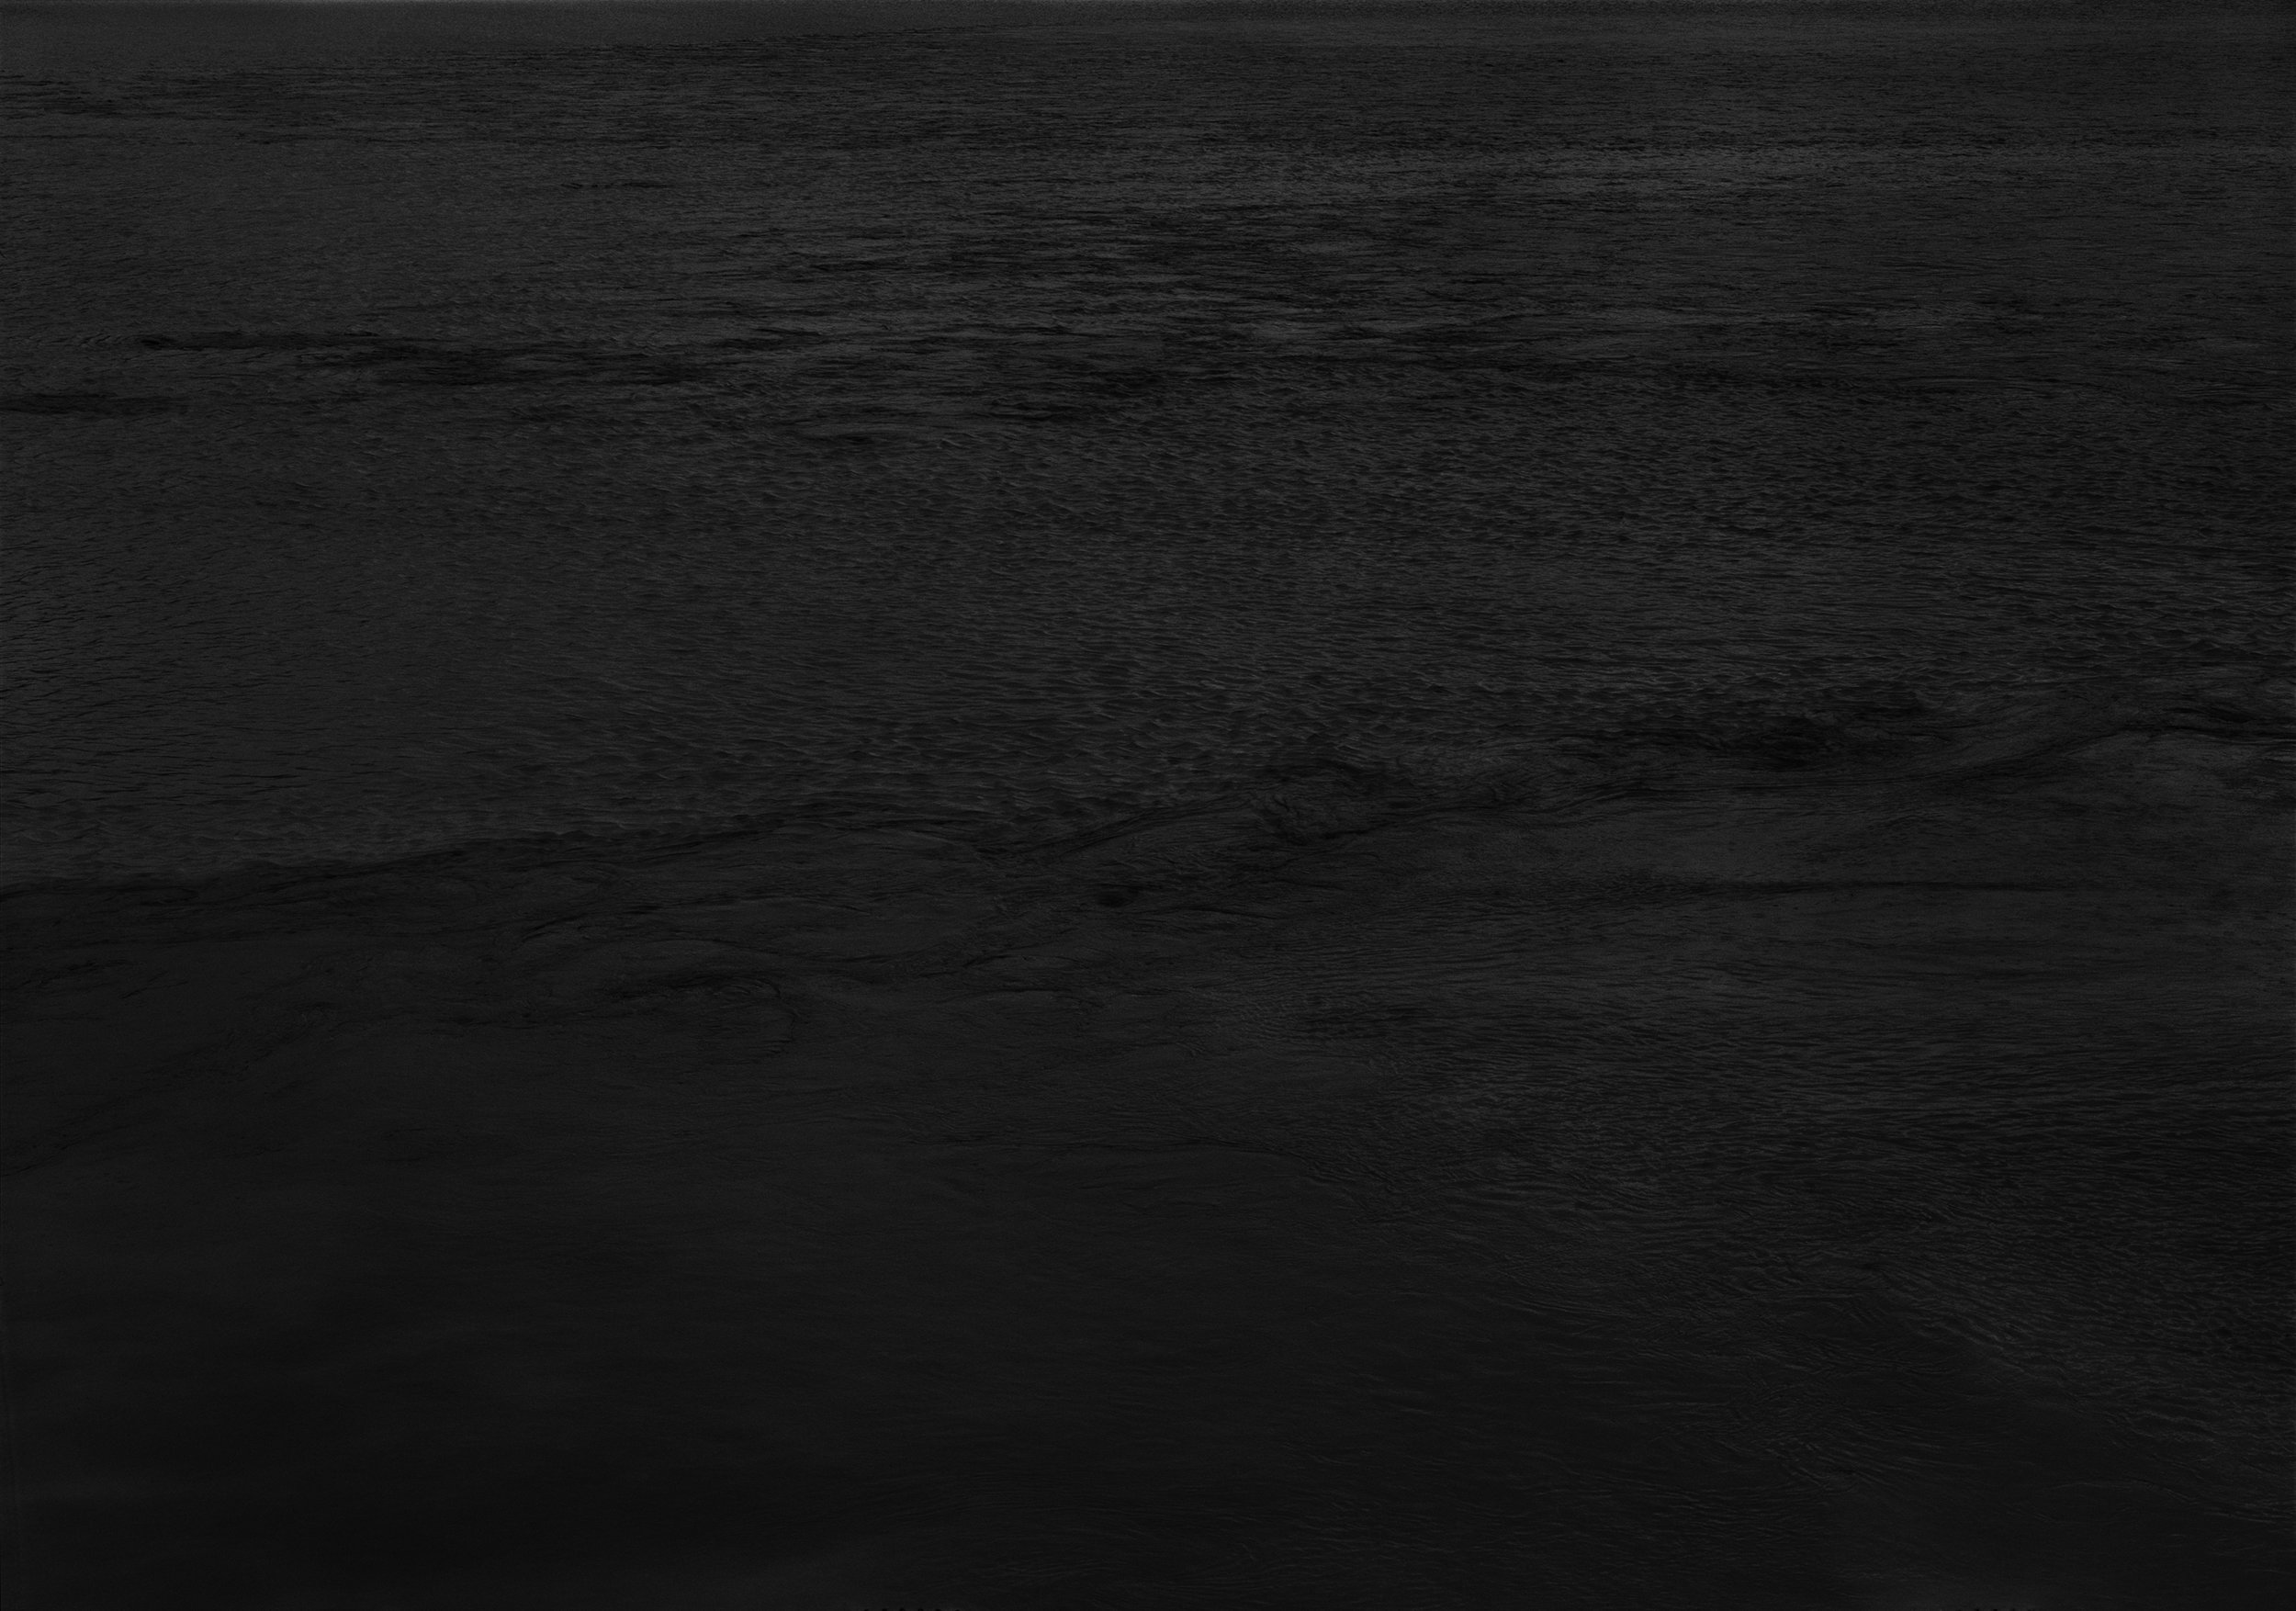 Sasha Bezzubov, Water 62, Photograph, Archival Pigment Print